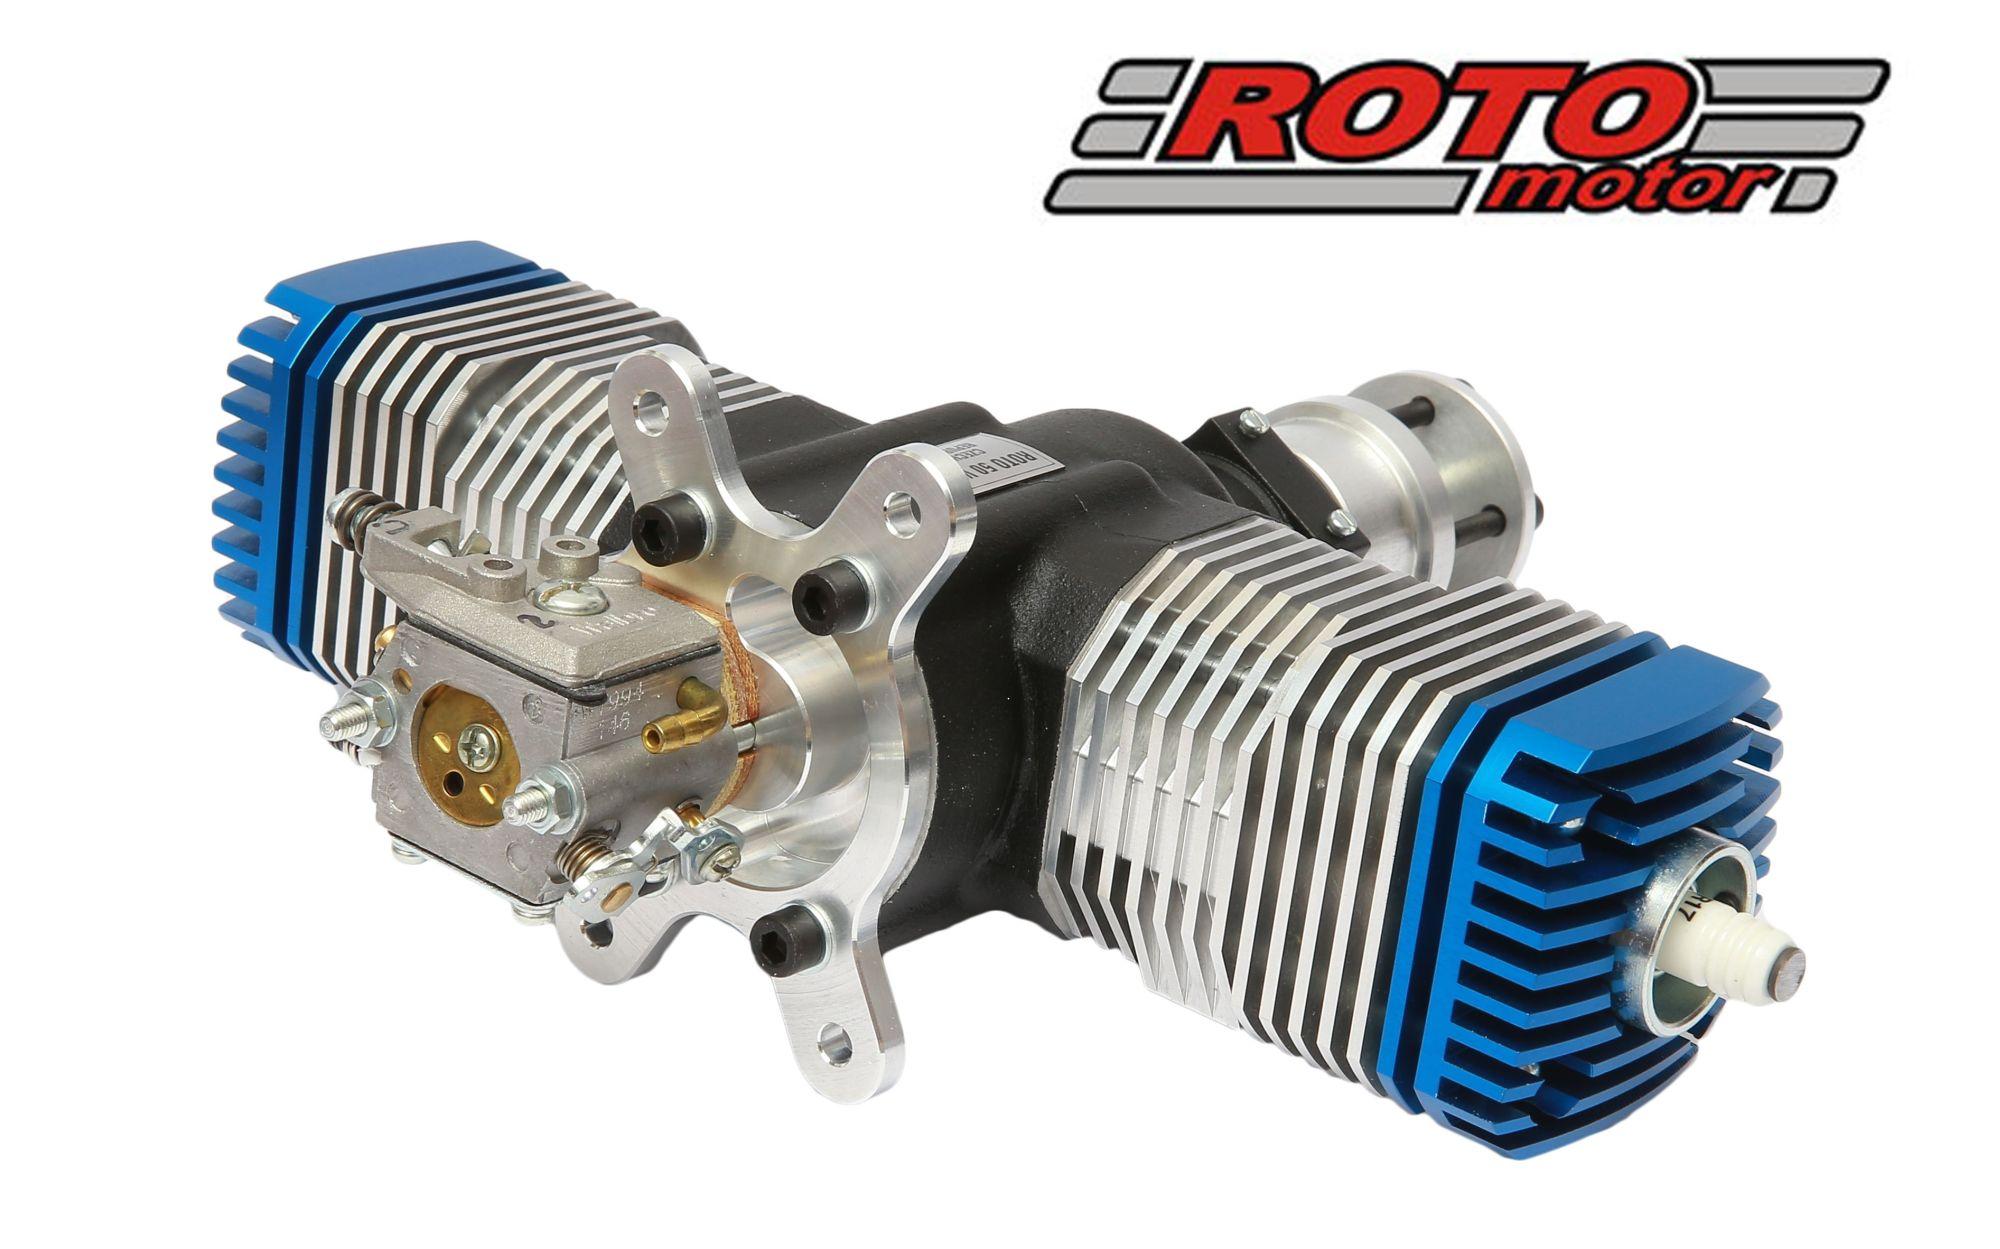 ROTO 50V2 50cc rc model gas engine (2000gr)